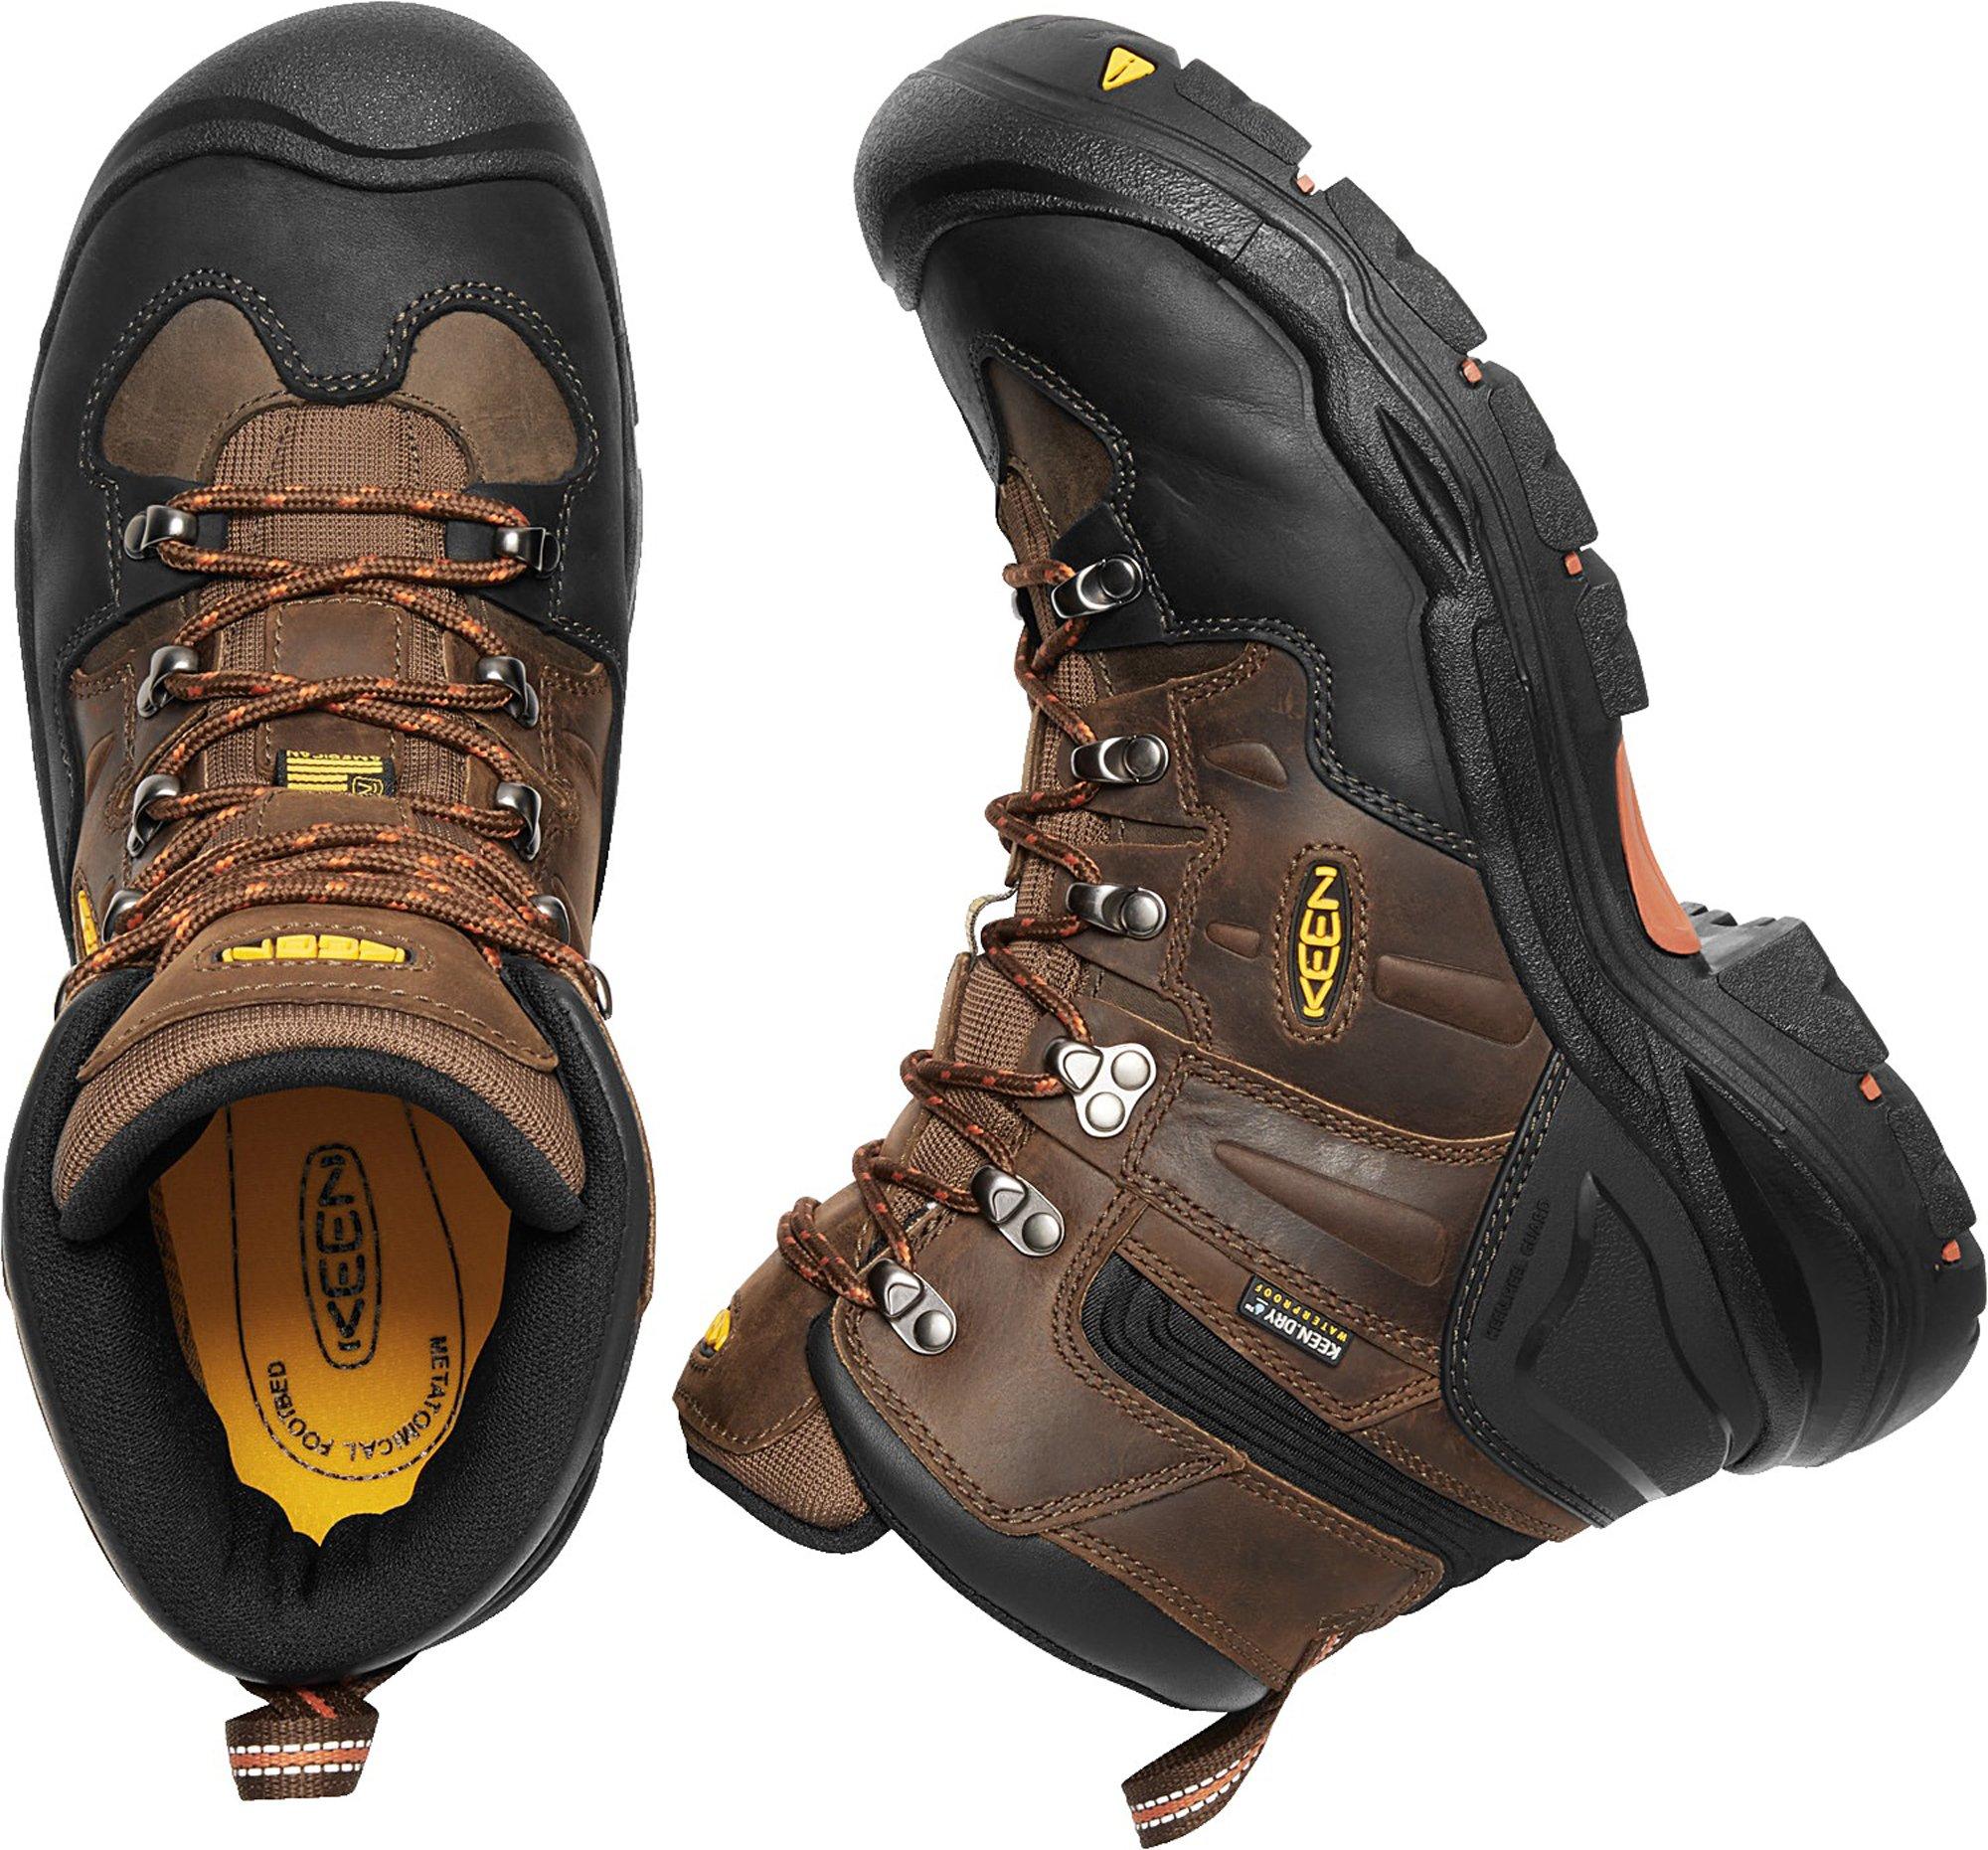 KEEN Utility Coburg 6'' WP (Steel Toe), Men's Work Boot, Cascade Brown/Brindle, 8 EE by KEEN Utility (Image #5)